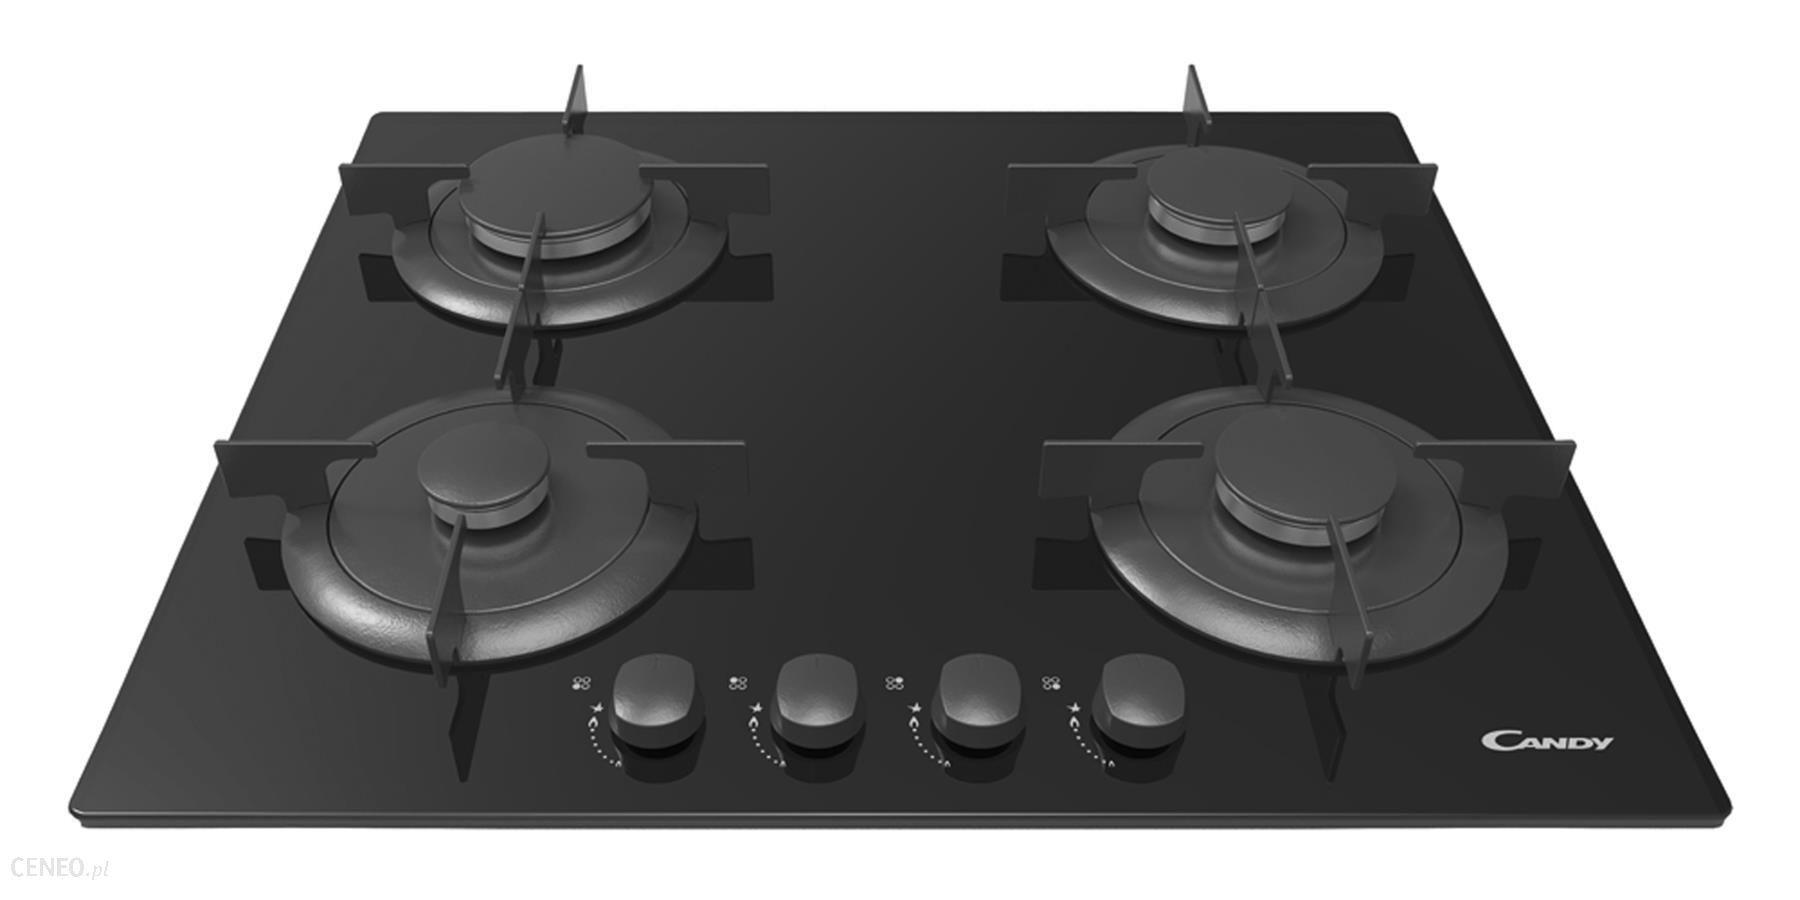 Plyta Gazowa Candy Cvg64spn Opinie I Ceny Na Ceneo Pl Stove Oven Kitchen Appliances